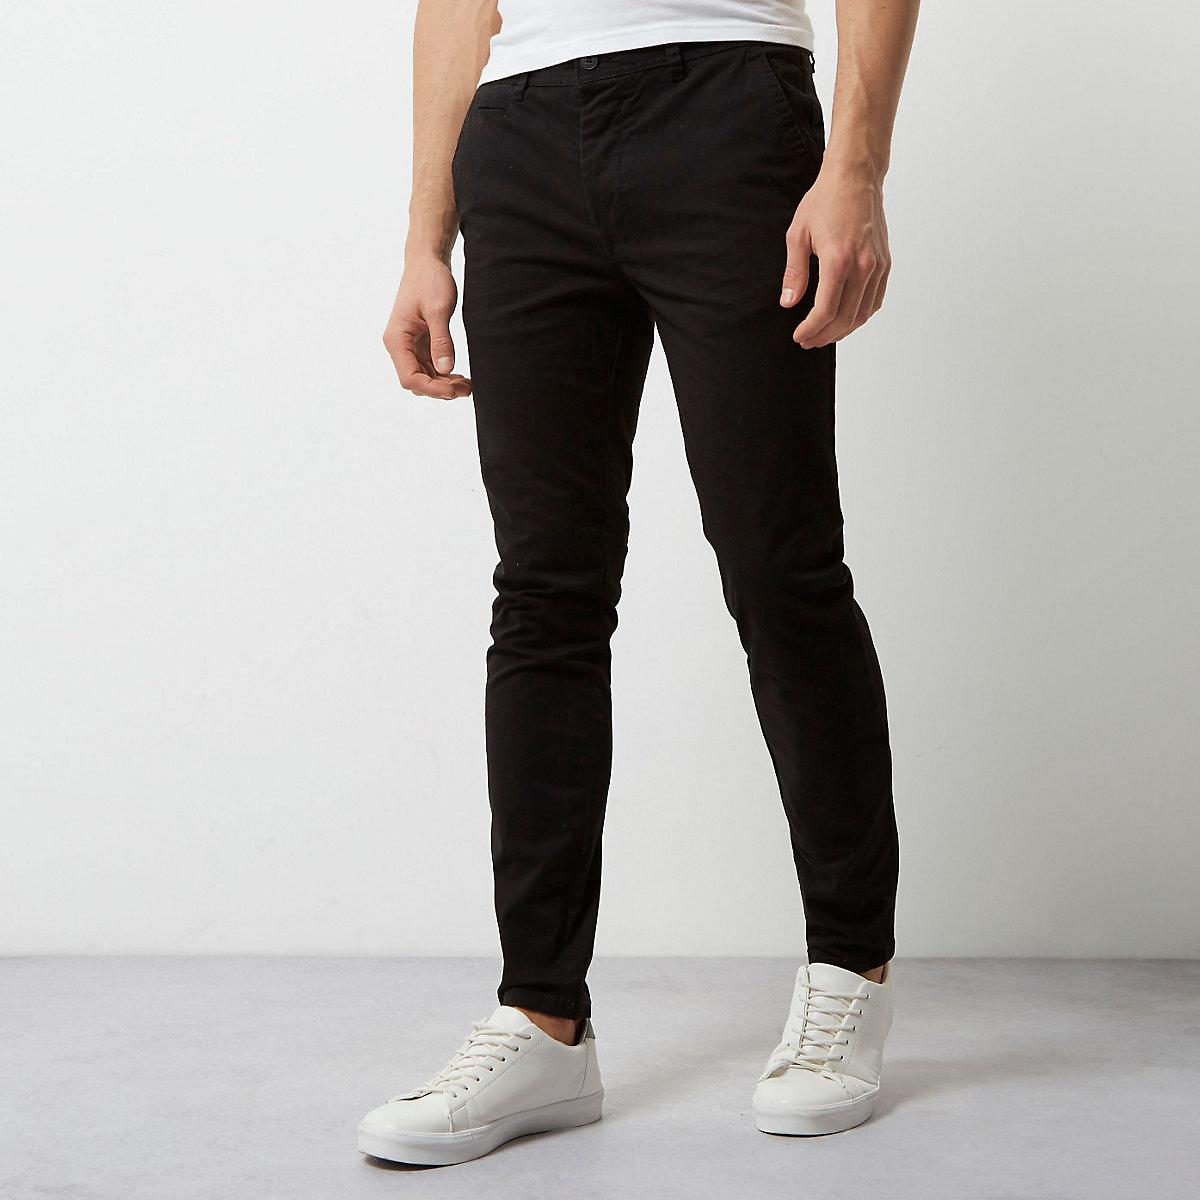 Pantalon chino casual coupe super skinny noir